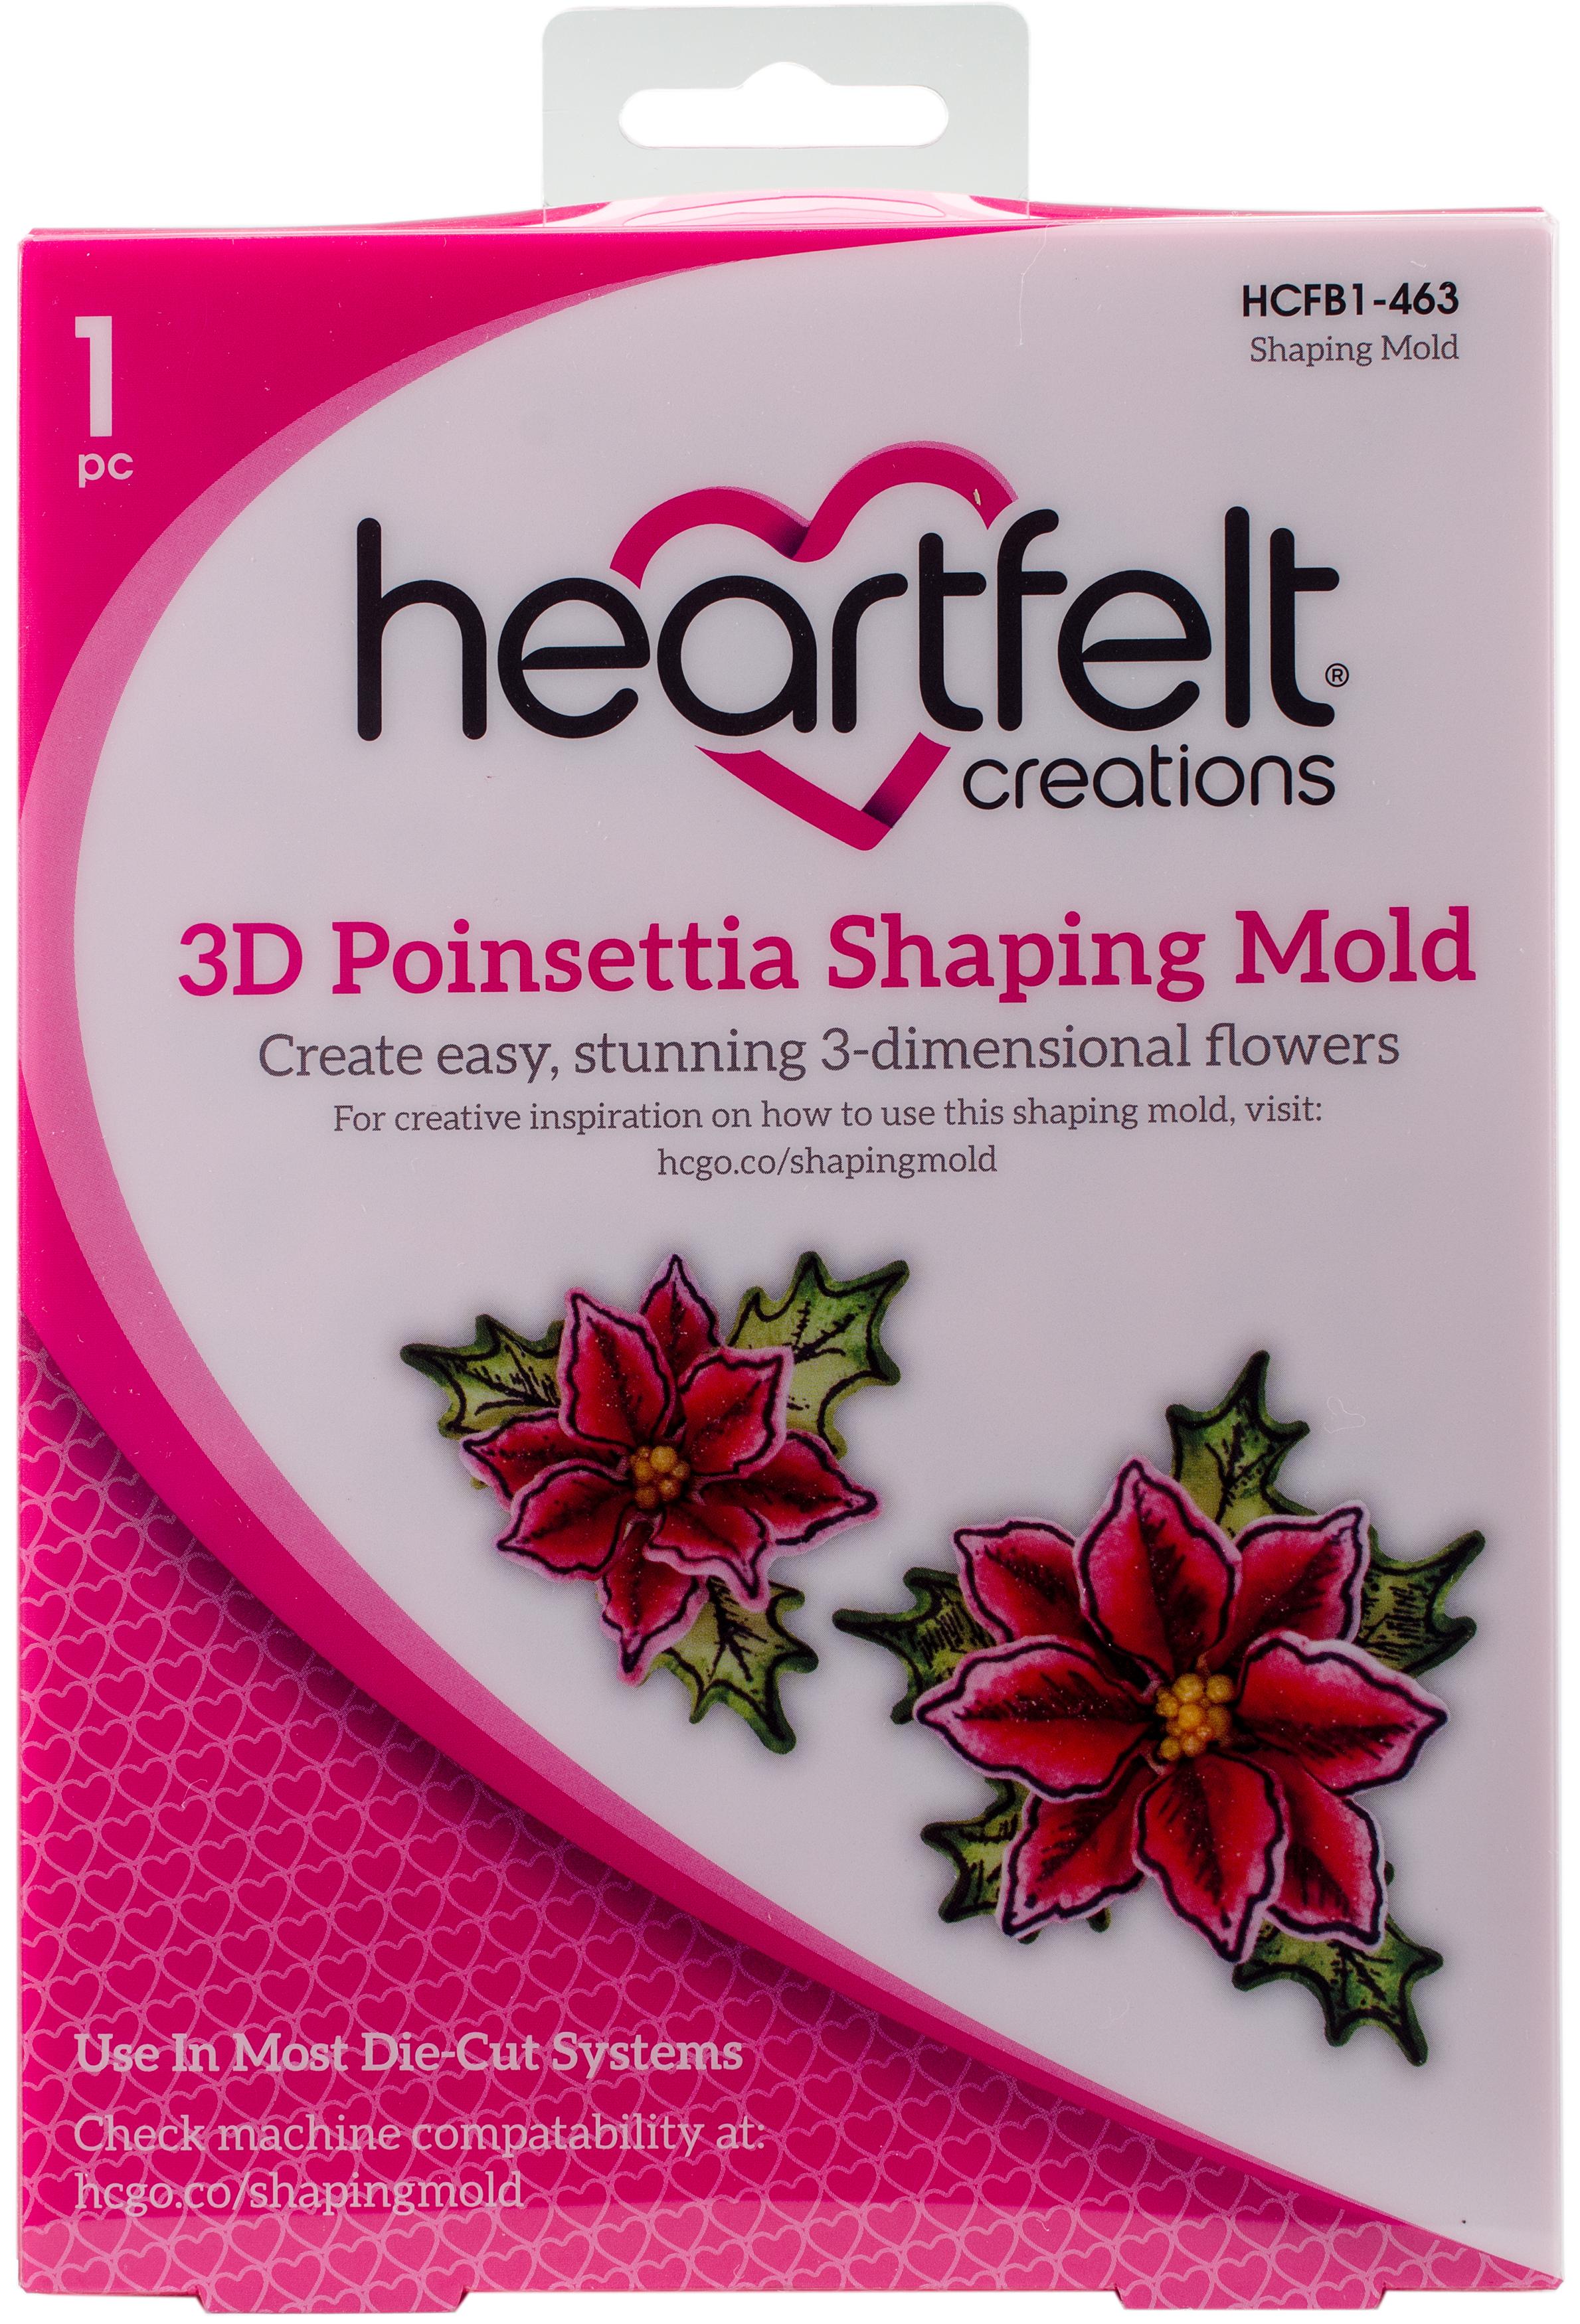 3D Poinsettia Shaping Mold